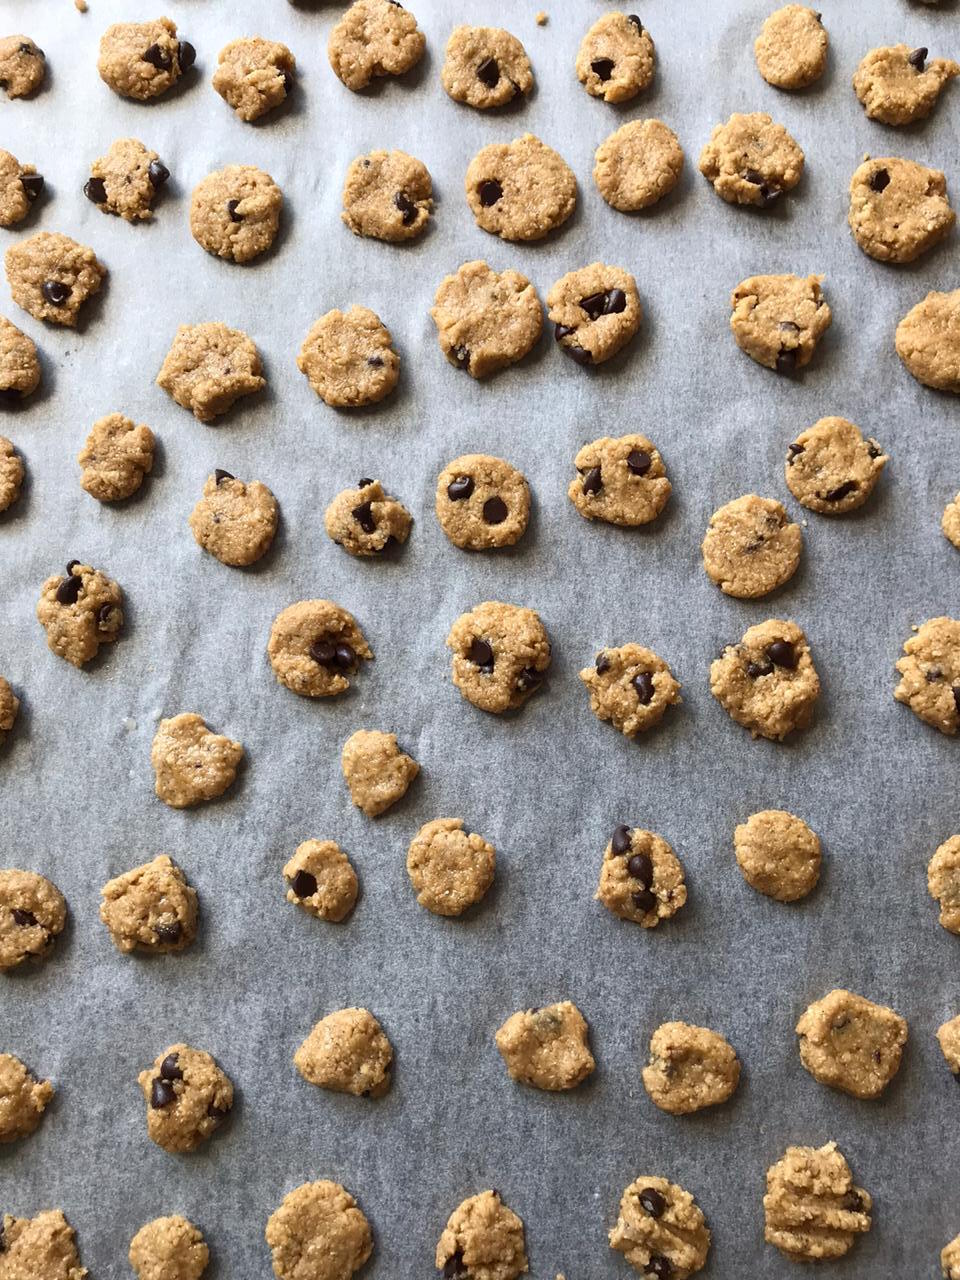 Rolling mini cookie dough balls onto a baking tray